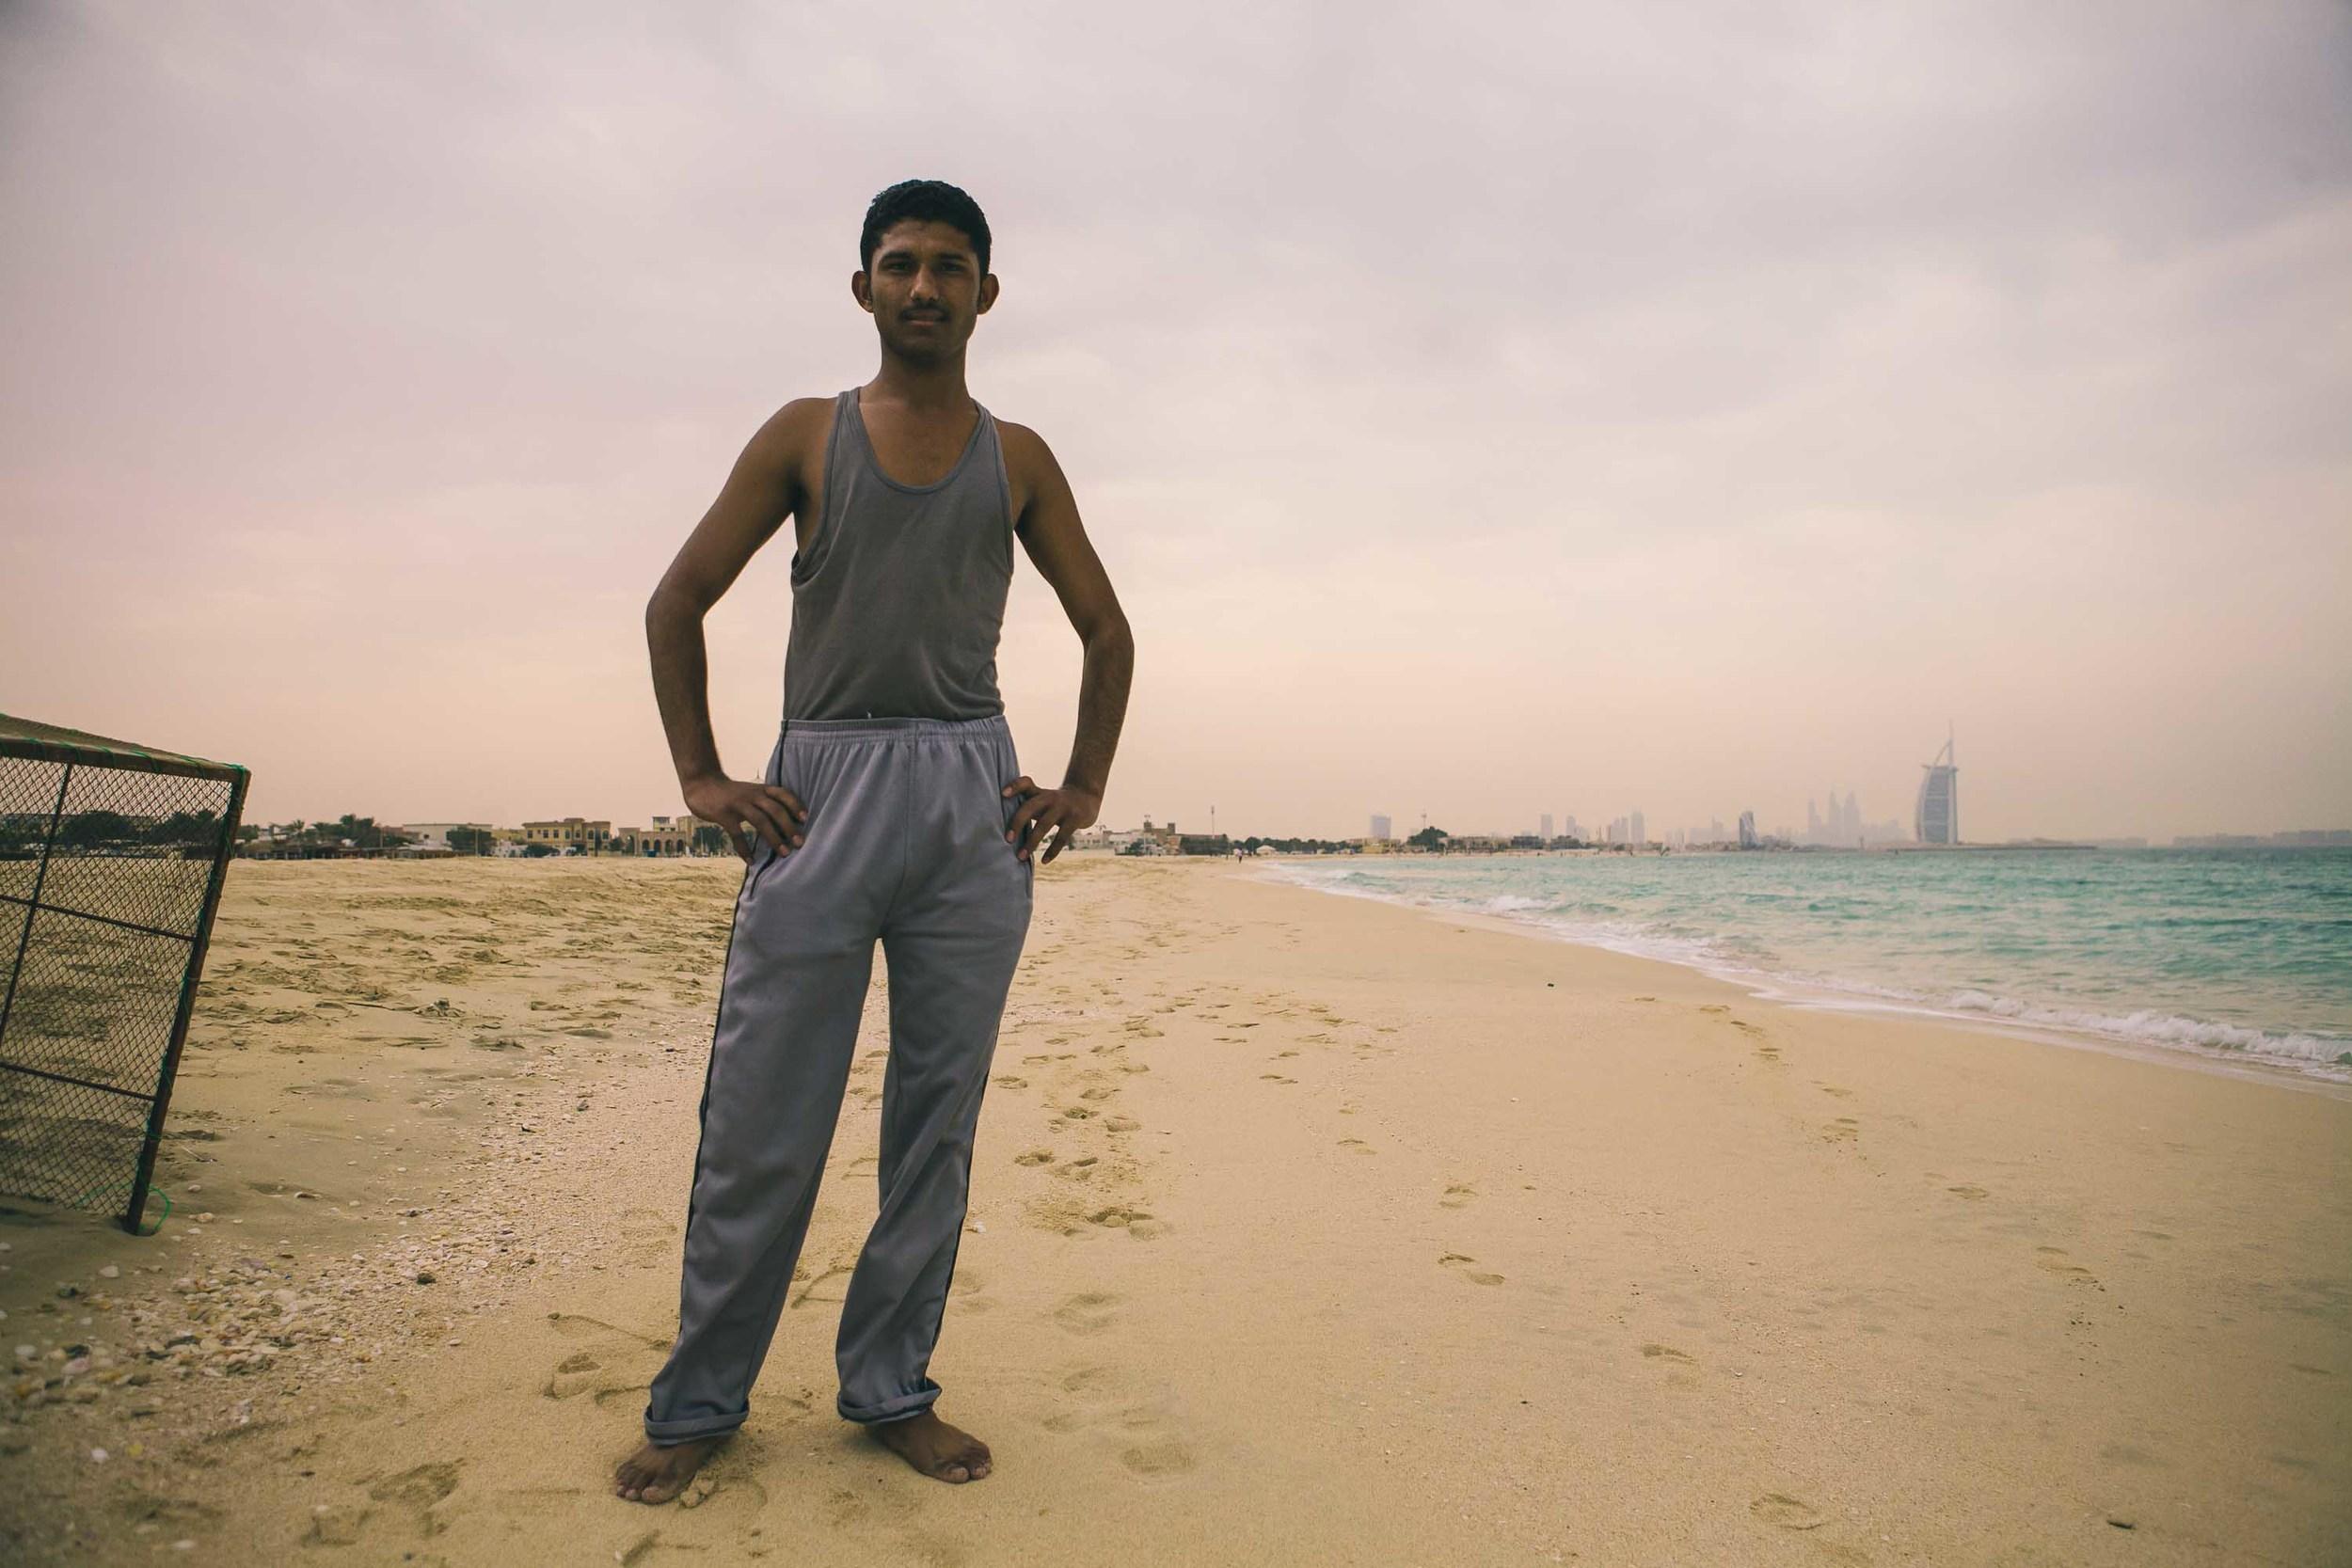 bryce-johnson-photography-actor-world-travel-explorer-photo-28.jpg